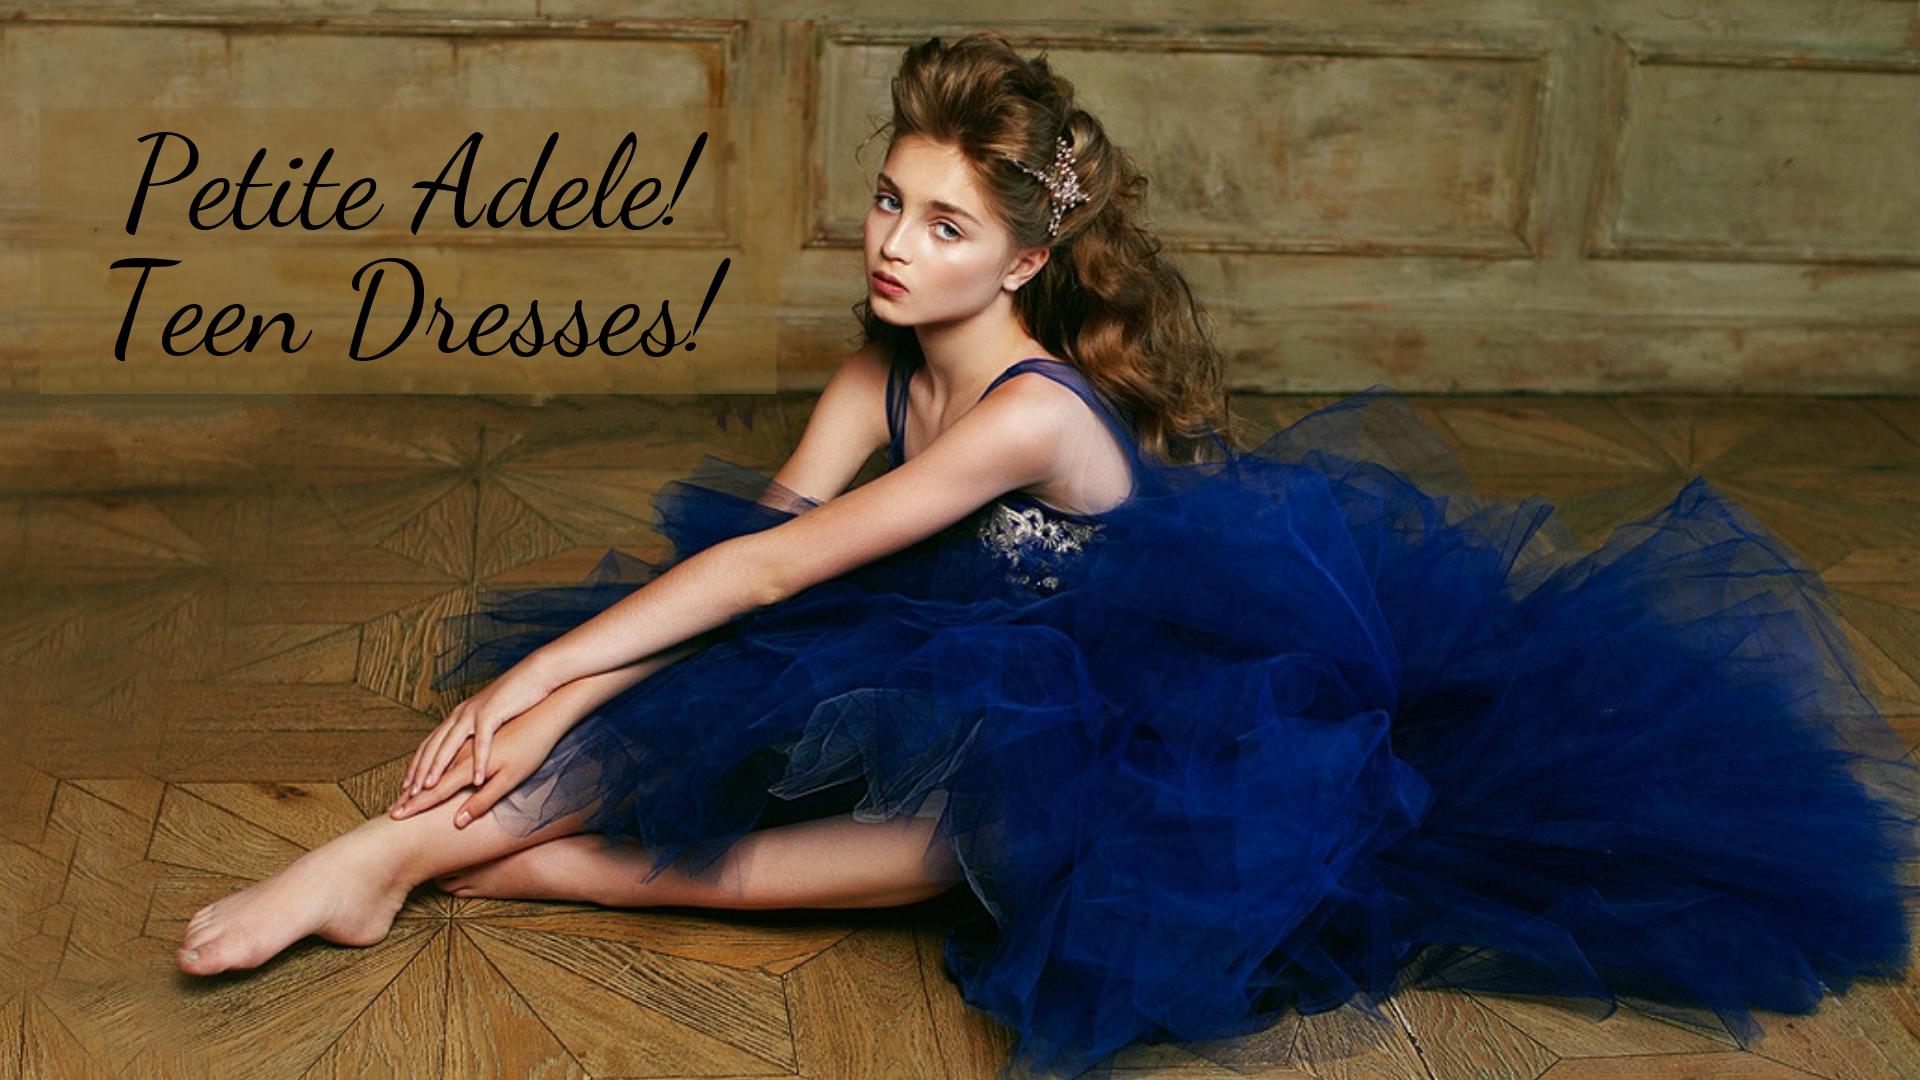 petite-adele-teen-dresses.png